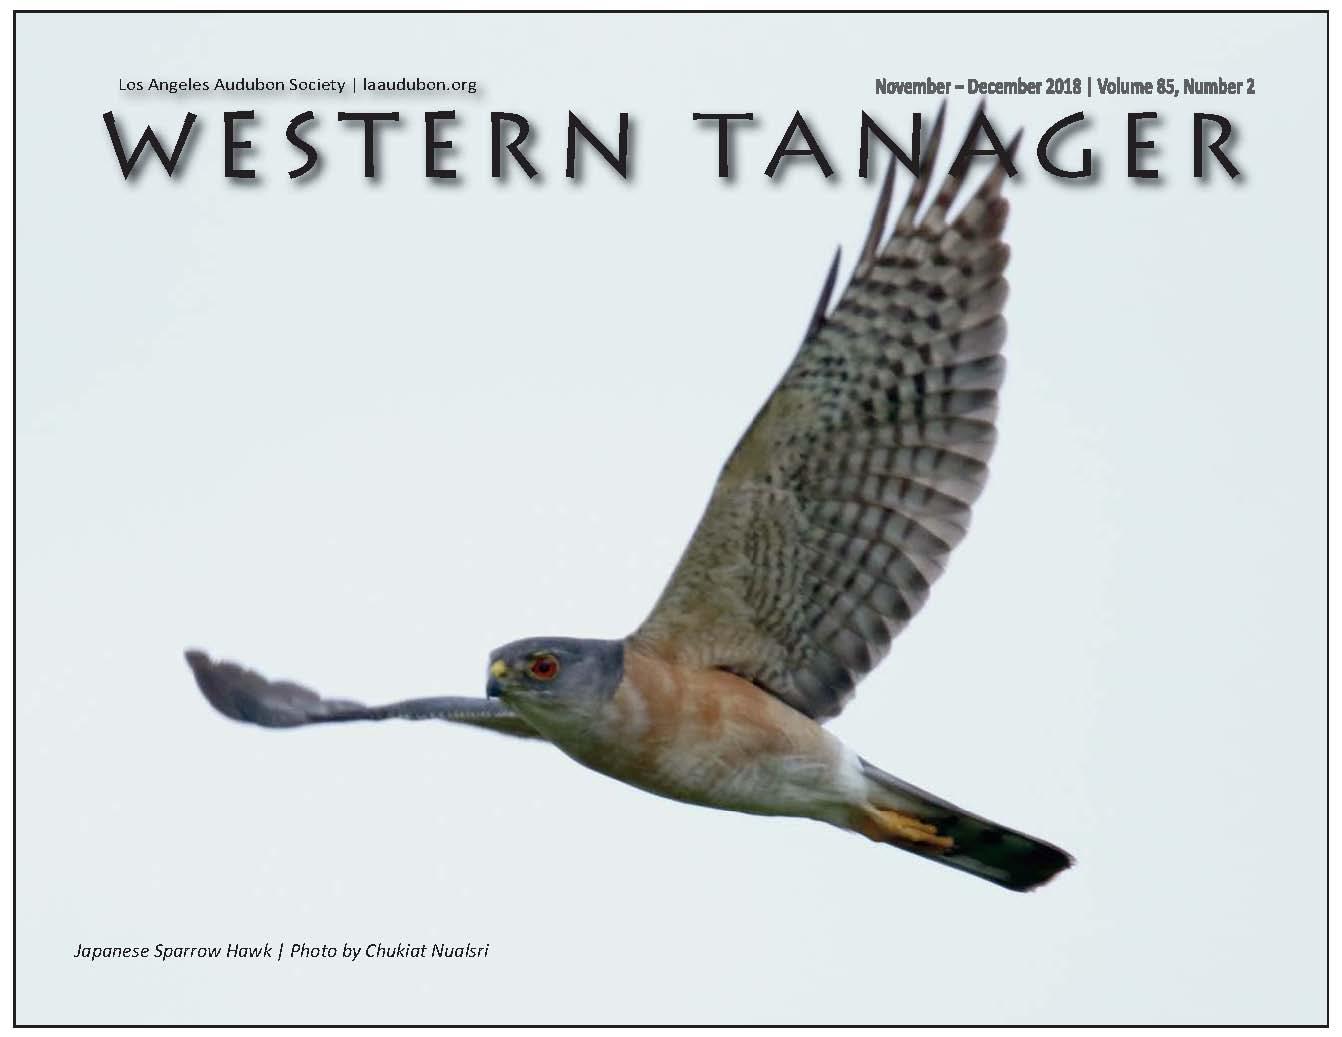 Japanese Sparrow Hawk   Photo by Chukiat Nualsri